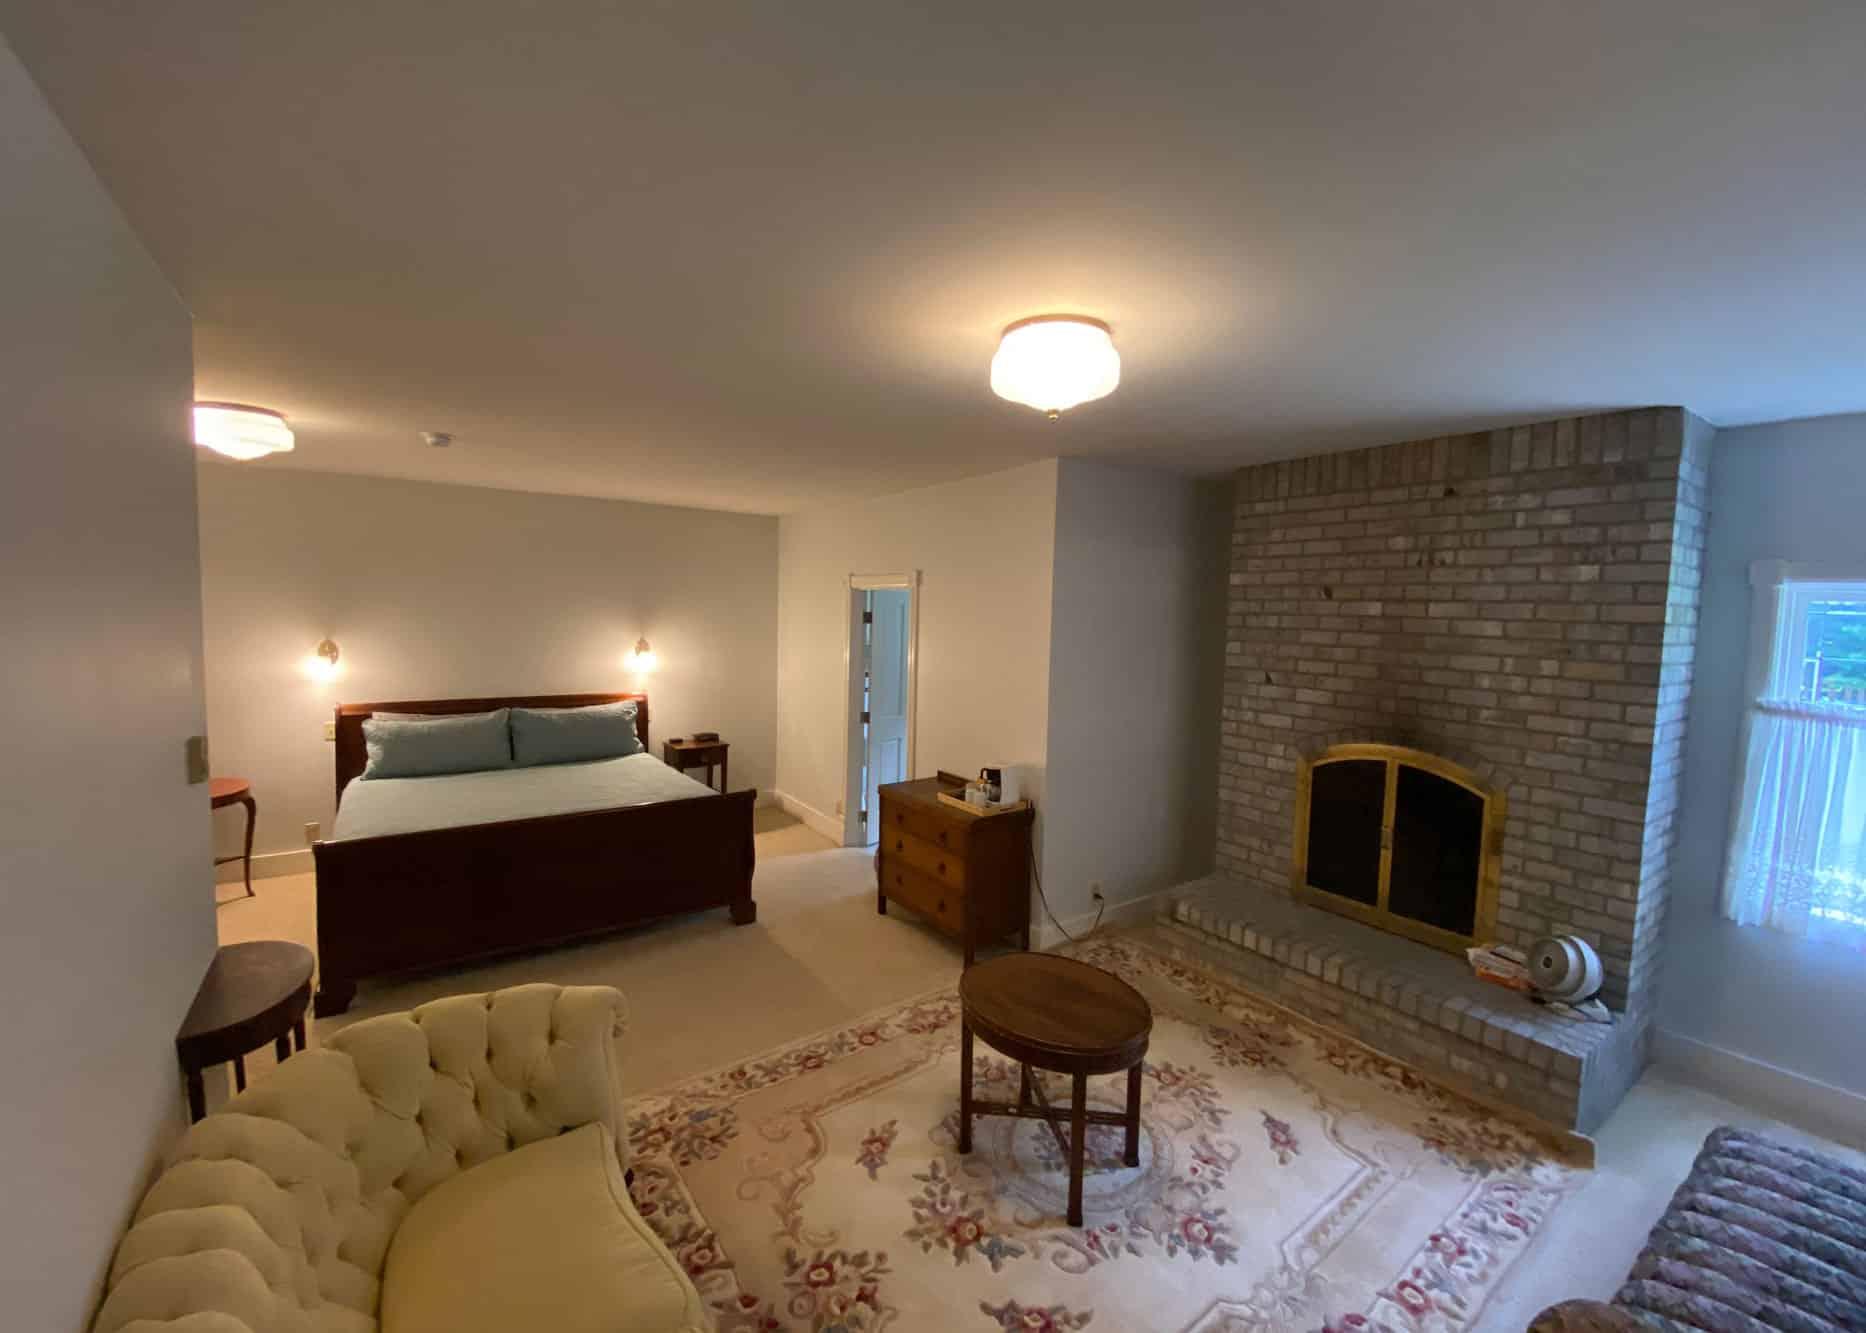 the-edenwild-inn-lopez-island-lodging-2020-room-02-01